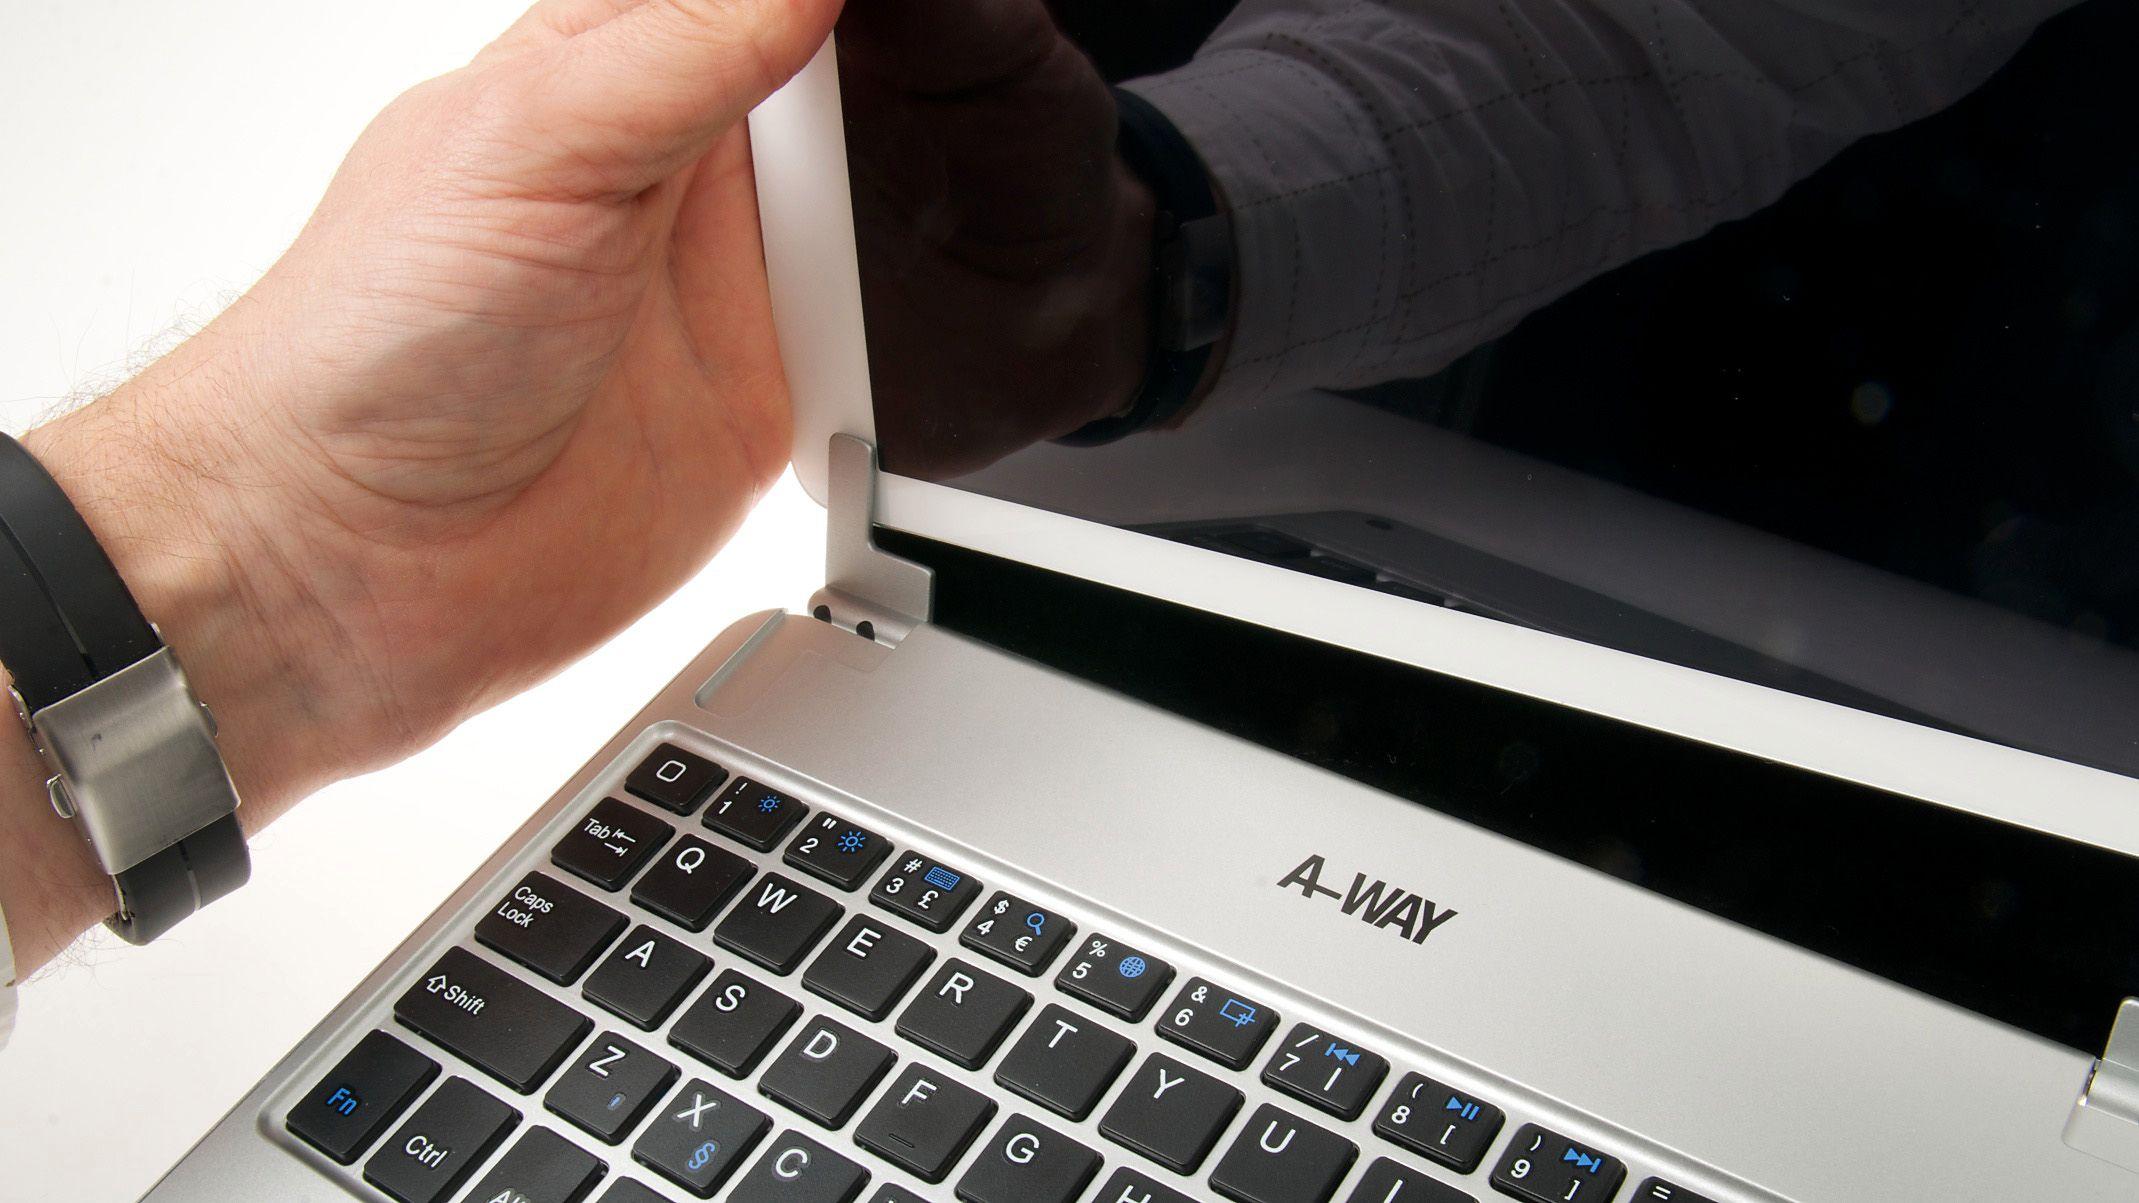 Lag en «MacBook»av iPad en din Tek.no